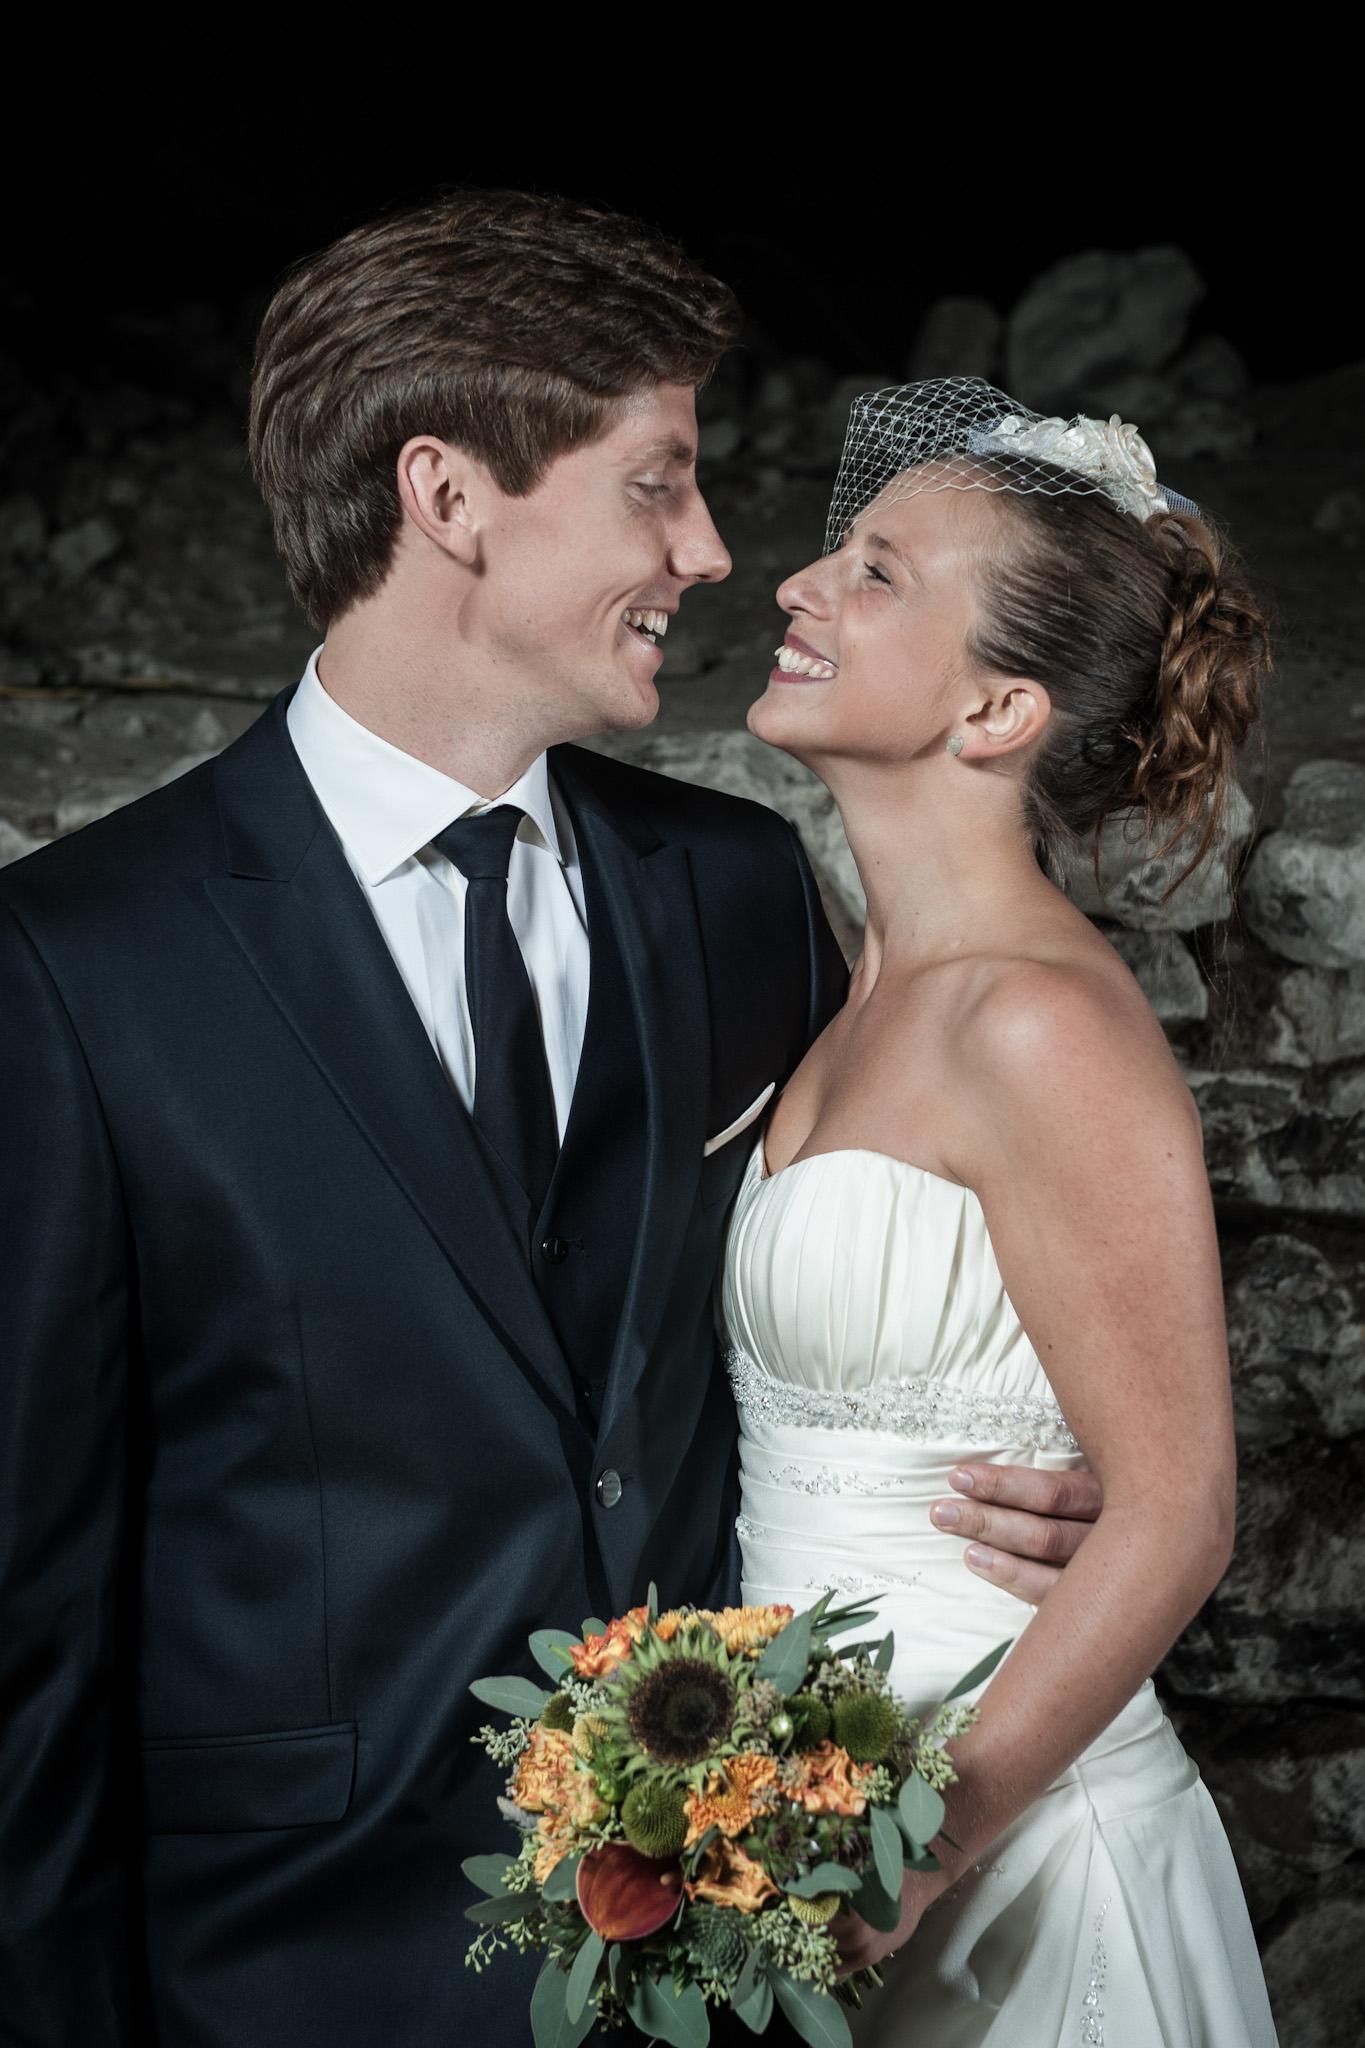 Bryllup_Vibeke_Pedersen_32